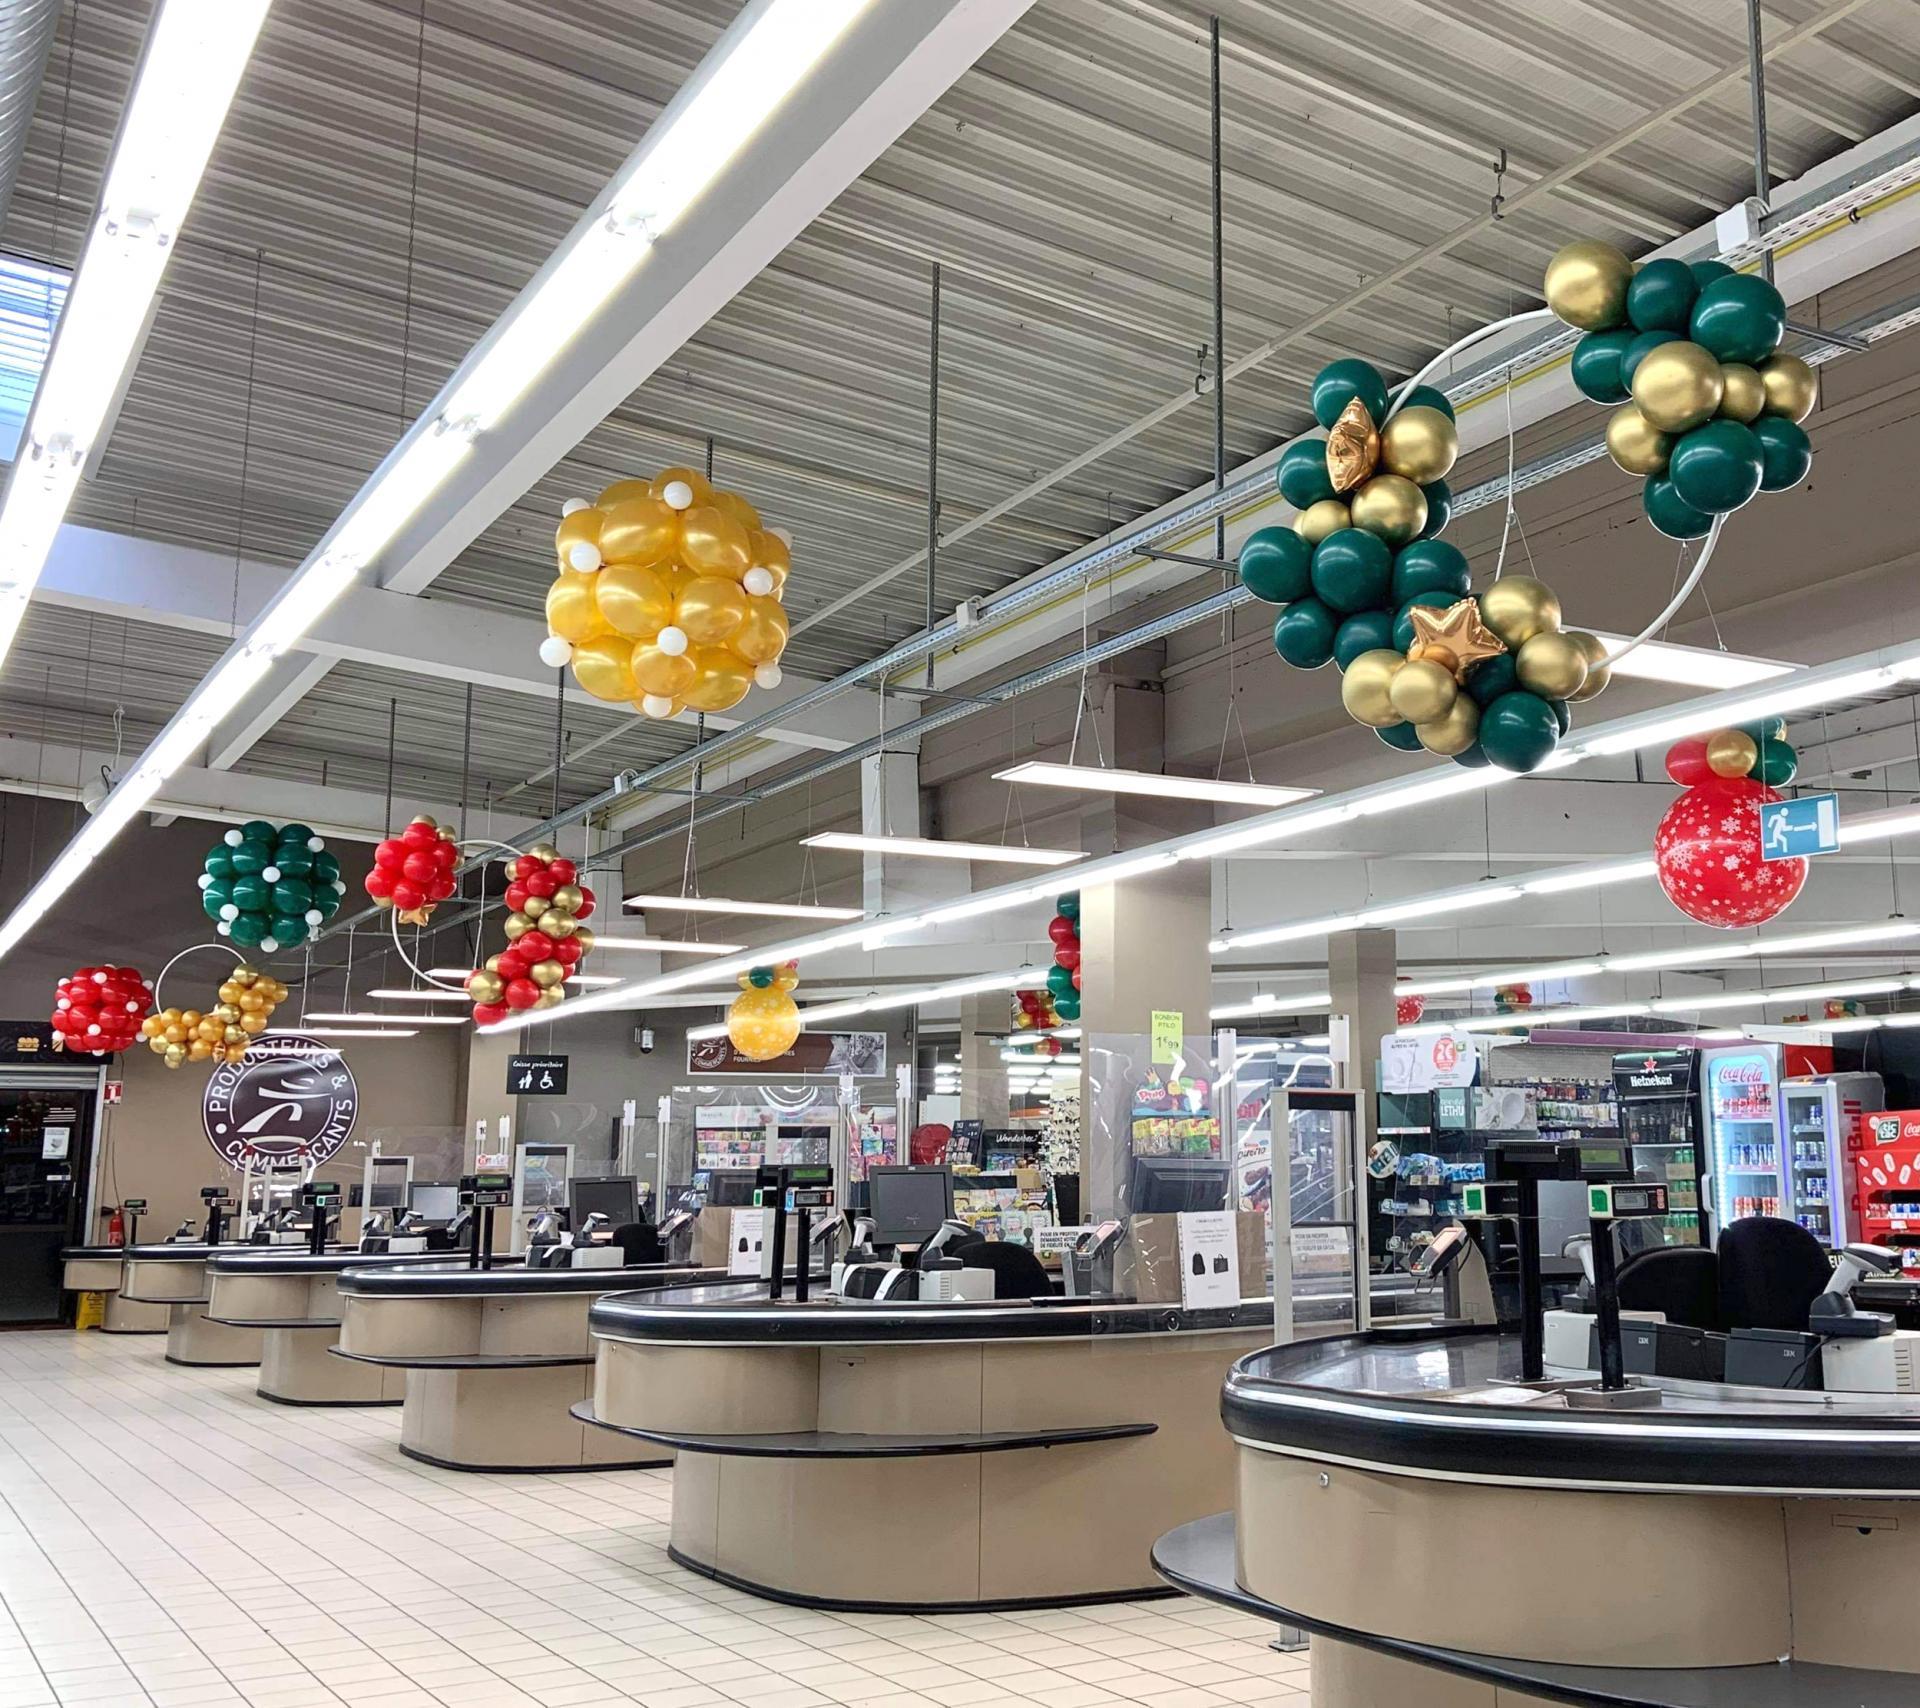 Guirlandes ballons magasin